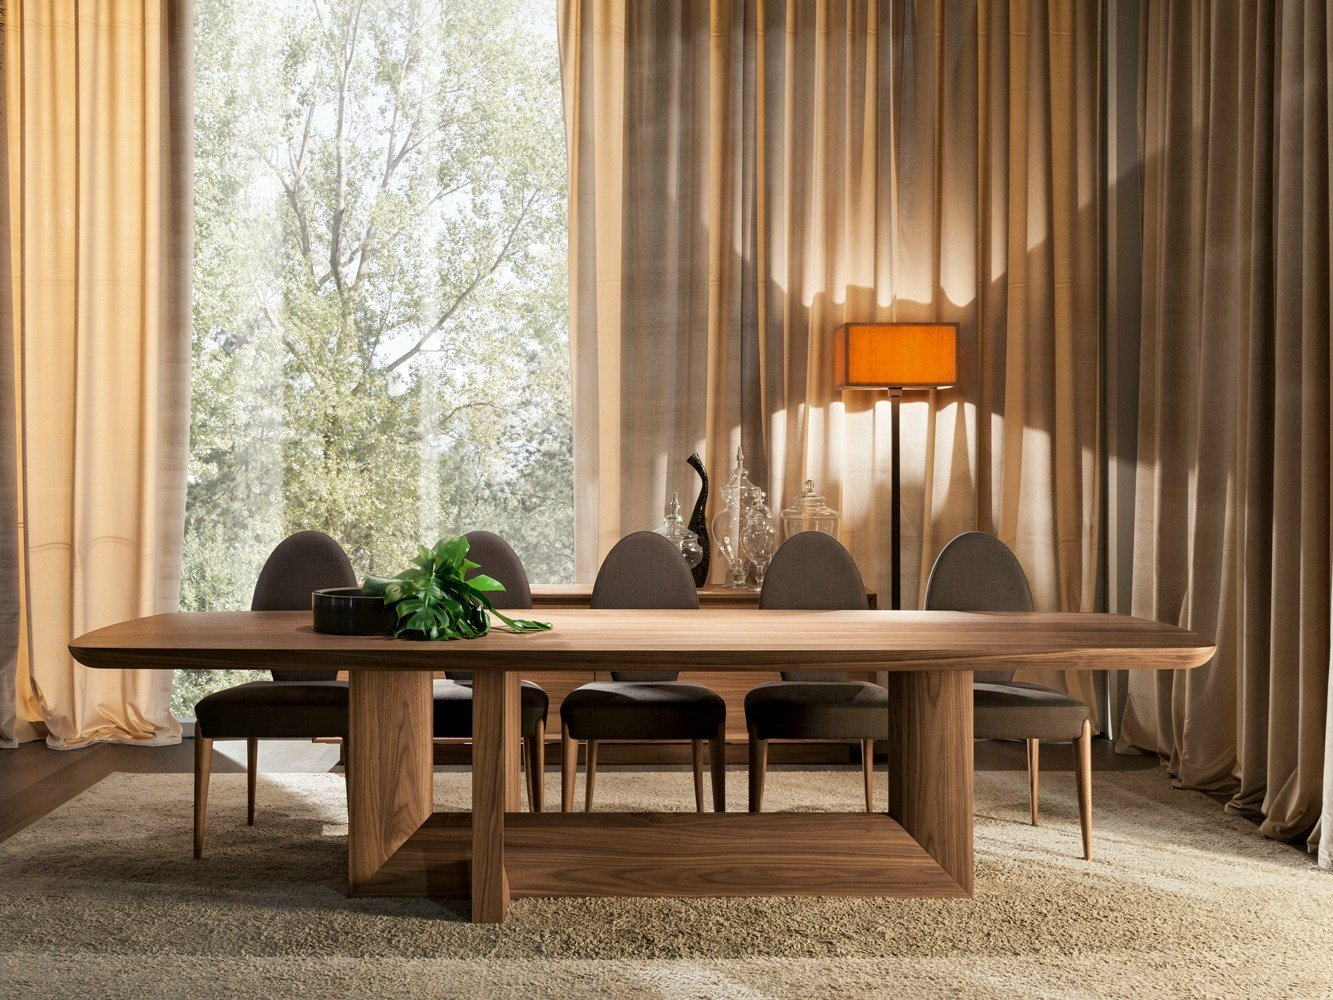 Indigo tavolo da pranzo by selva design leonardo dainelli - Tavola da pranzo ...